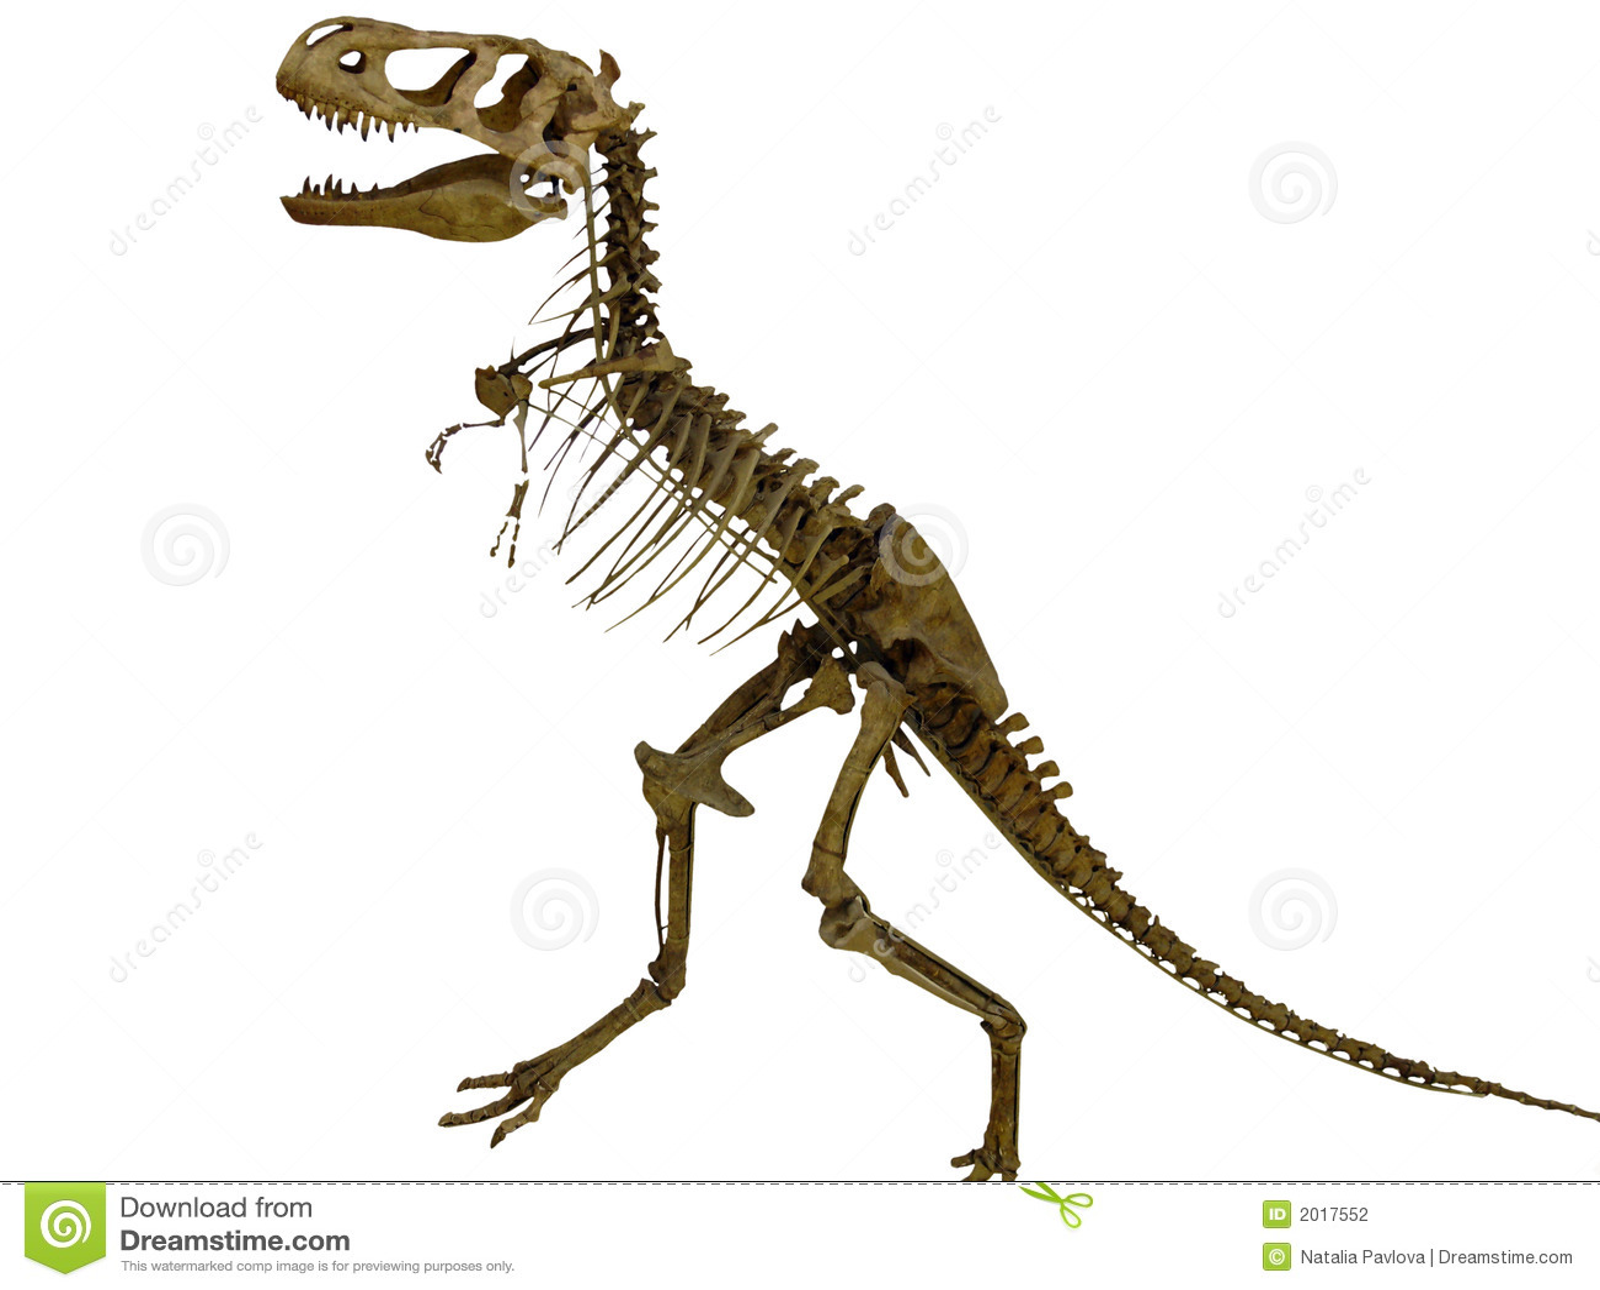 Skeleton Of The Dinosaur Stock Photo. Image Of Bite